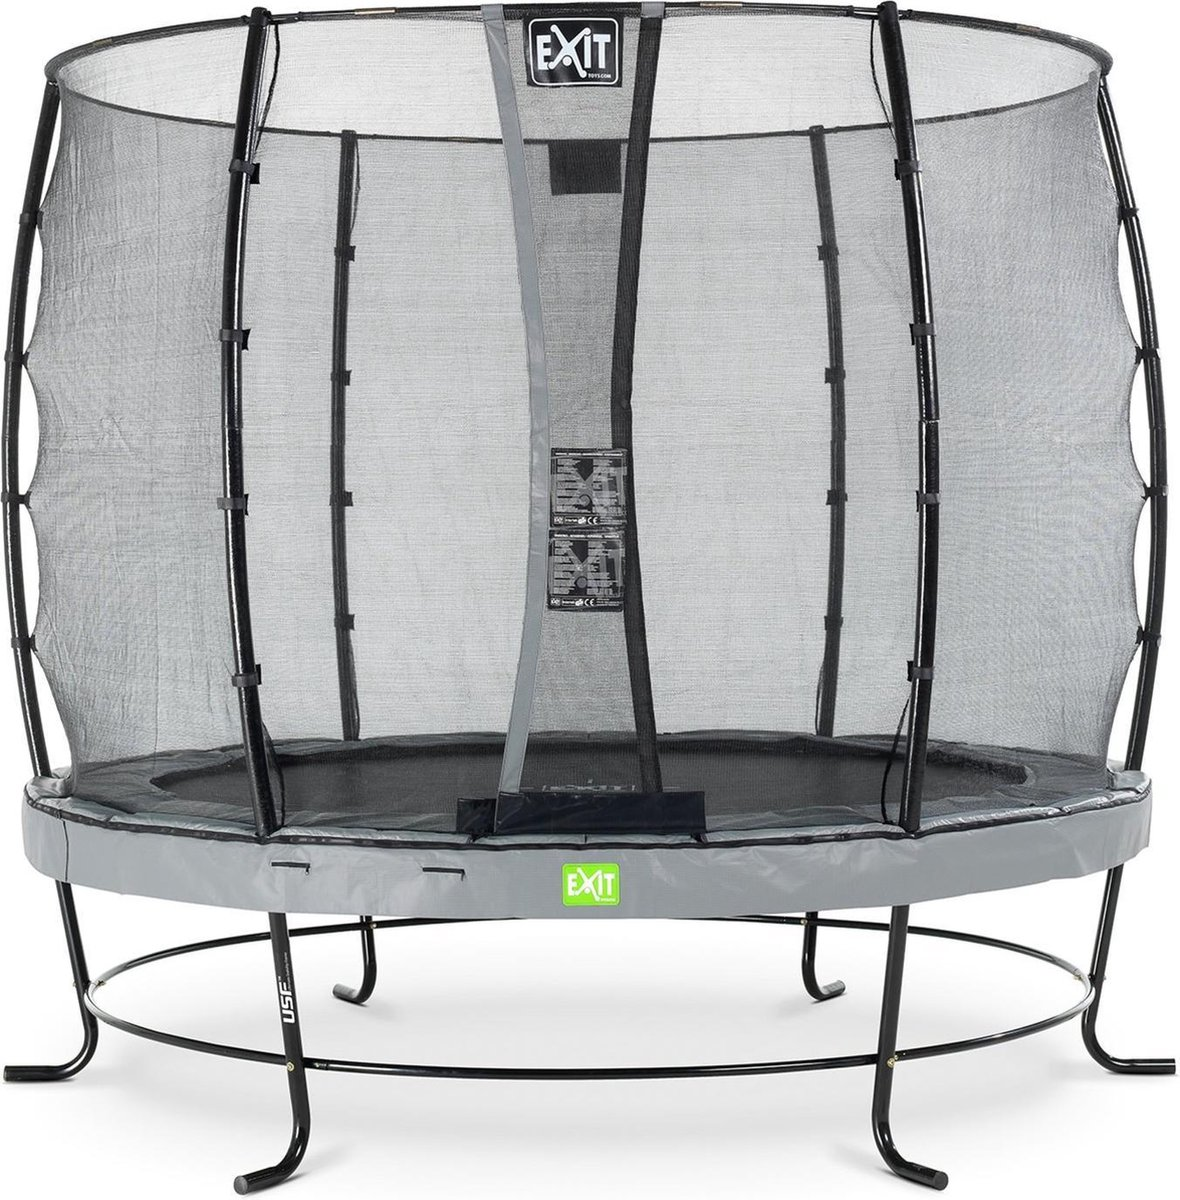 Trampoline EXIT Elegant - ø253cm met net Economy - grijs